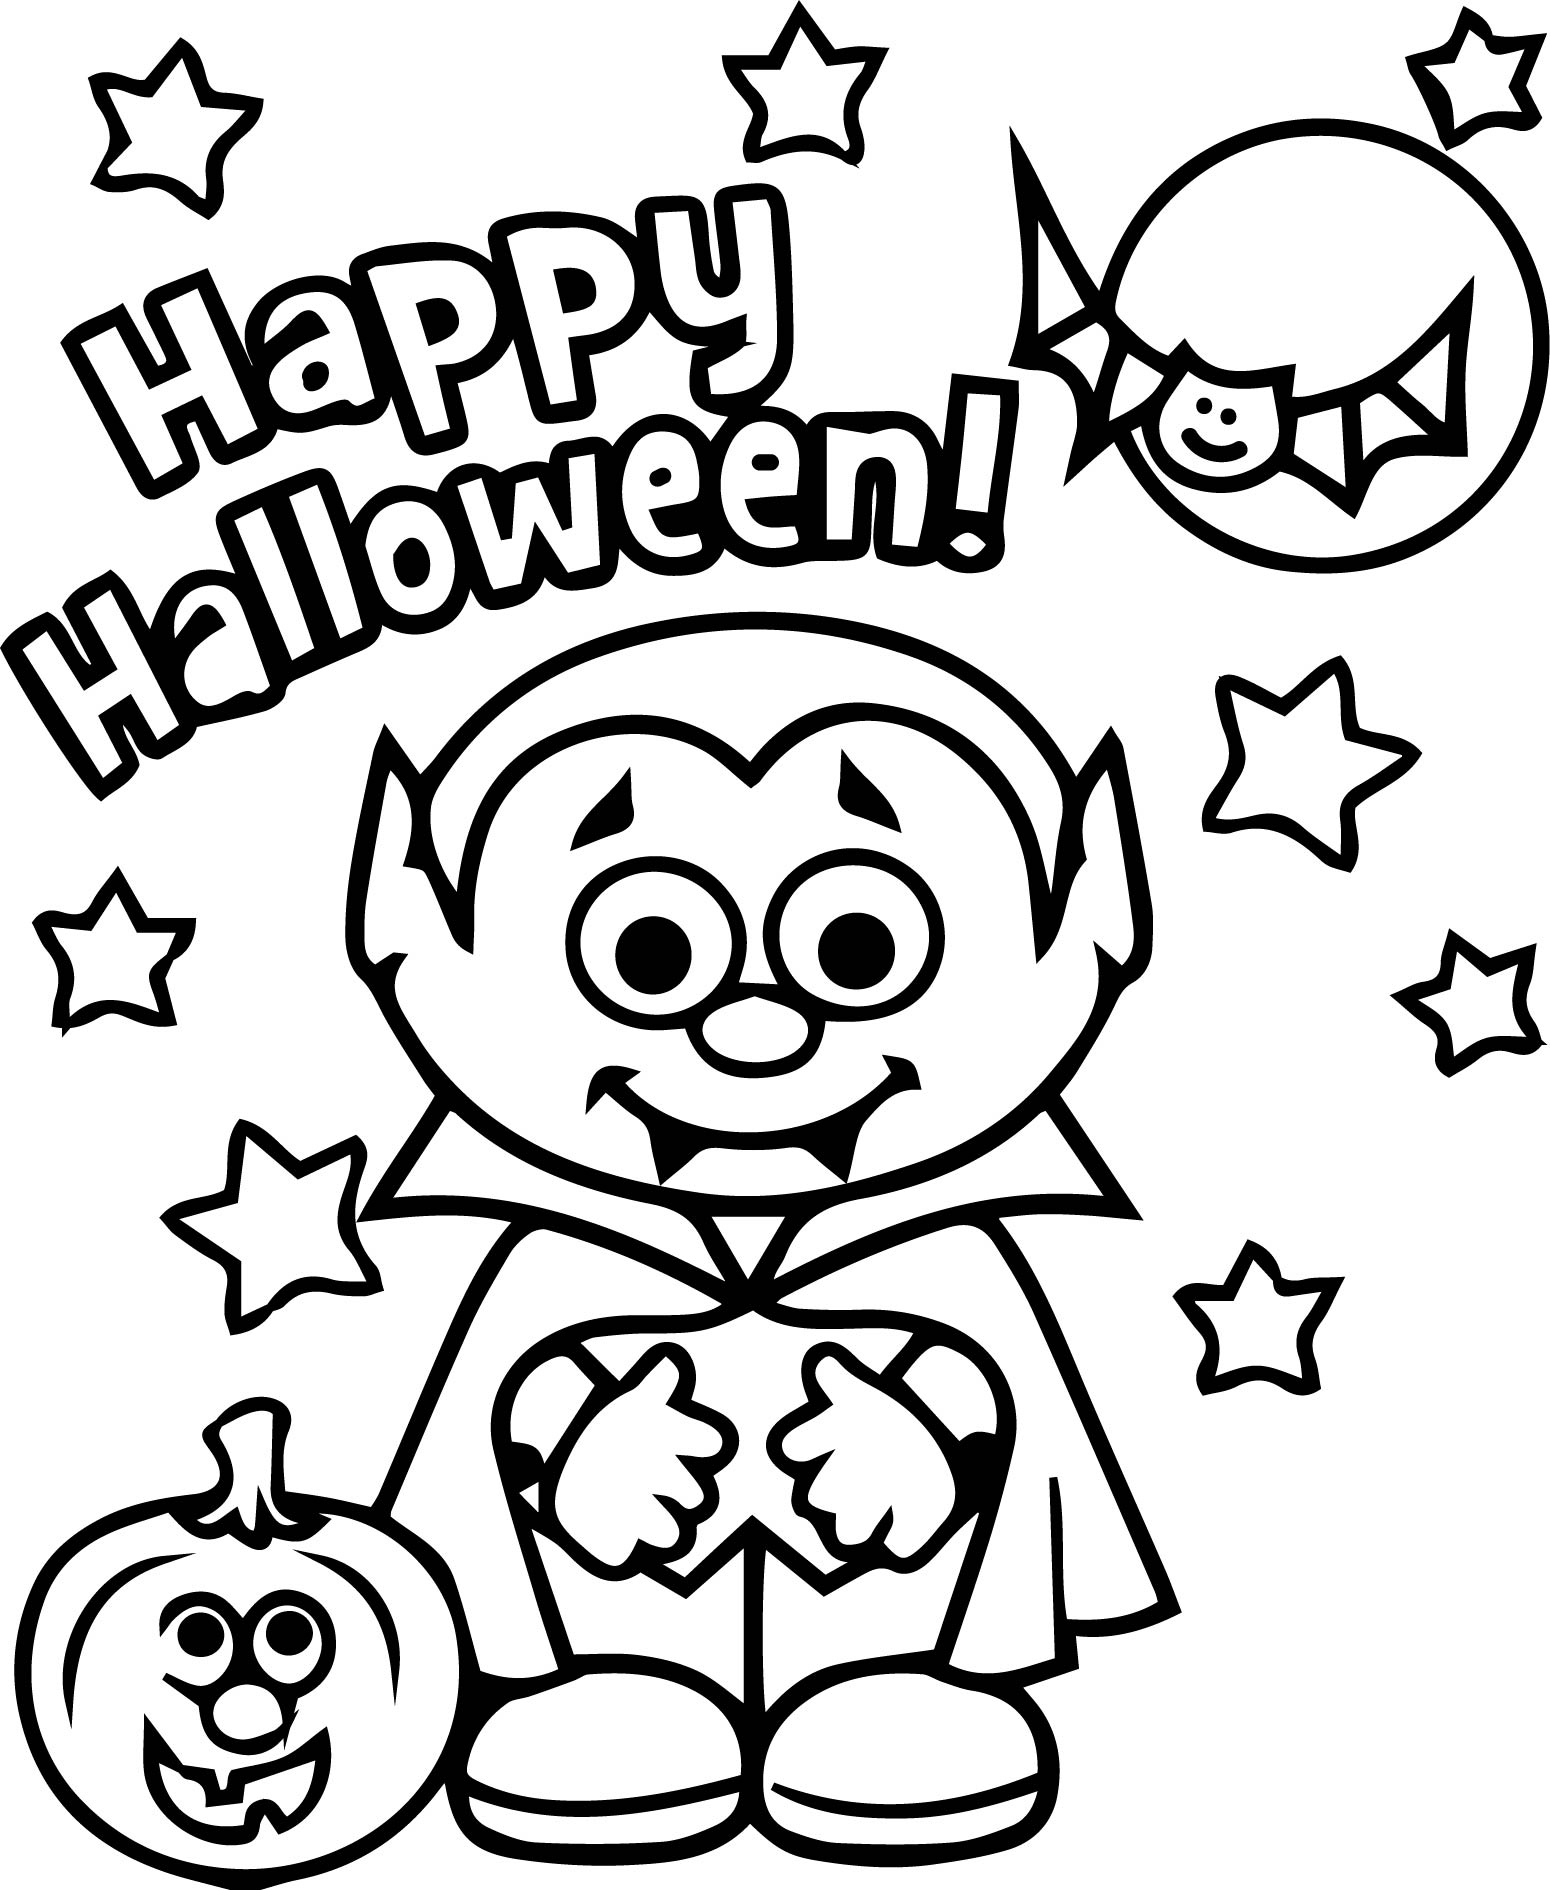 Vampire best happy halloween coloring page